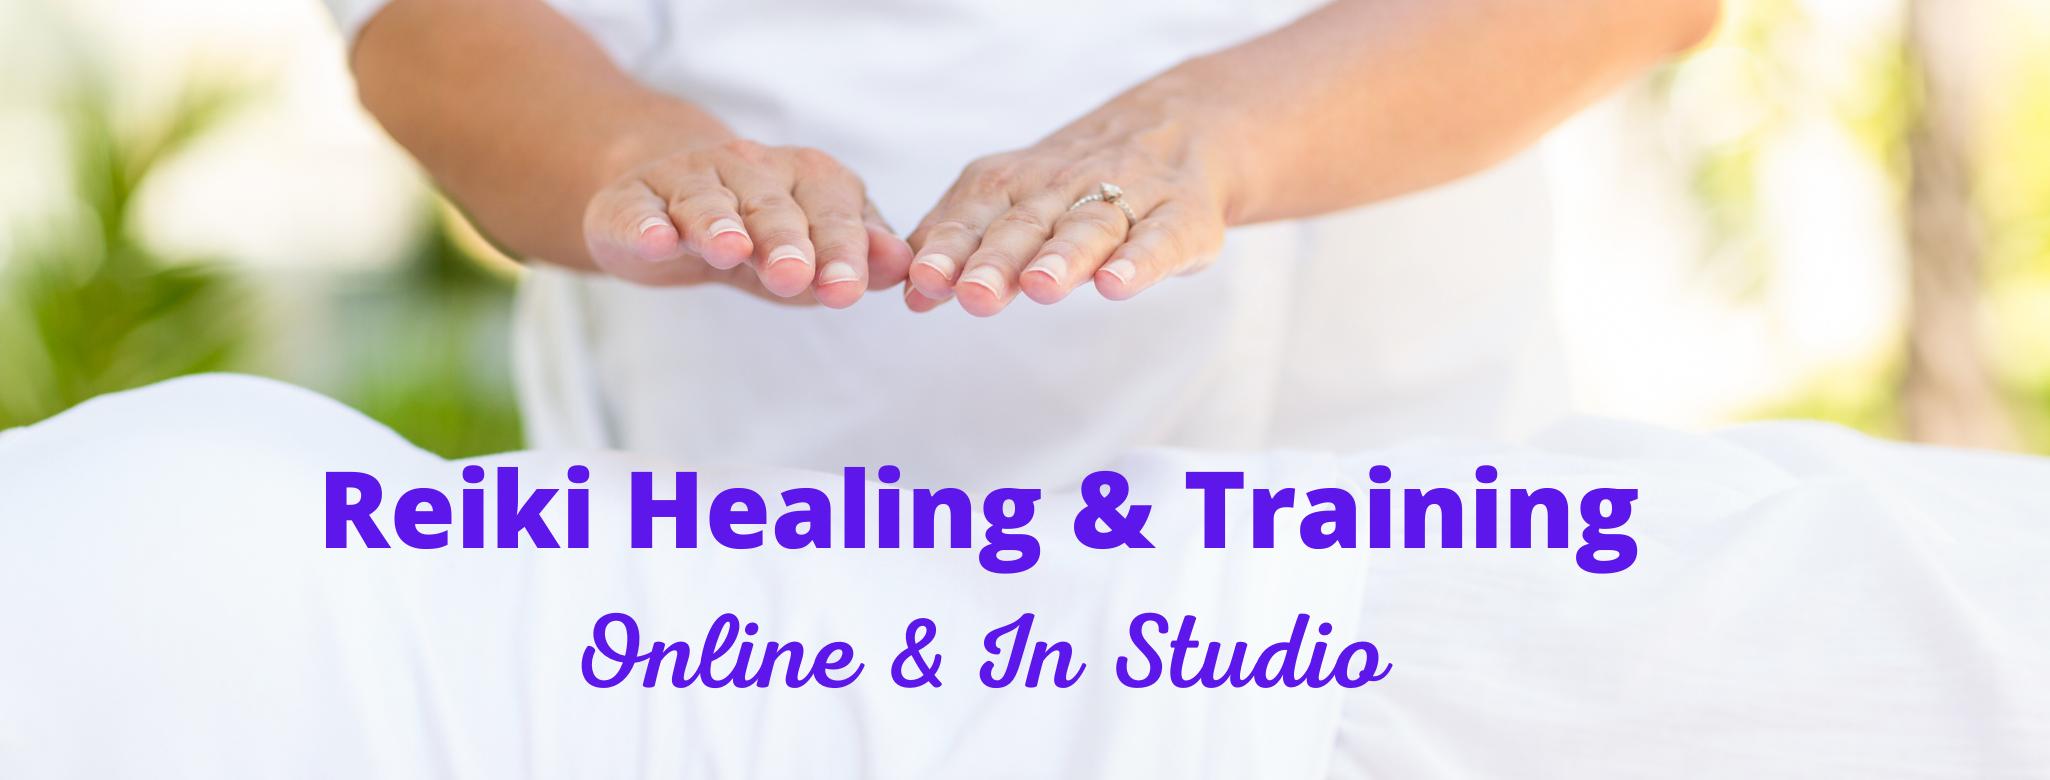 Reiki Healing & Training Online & In Studio